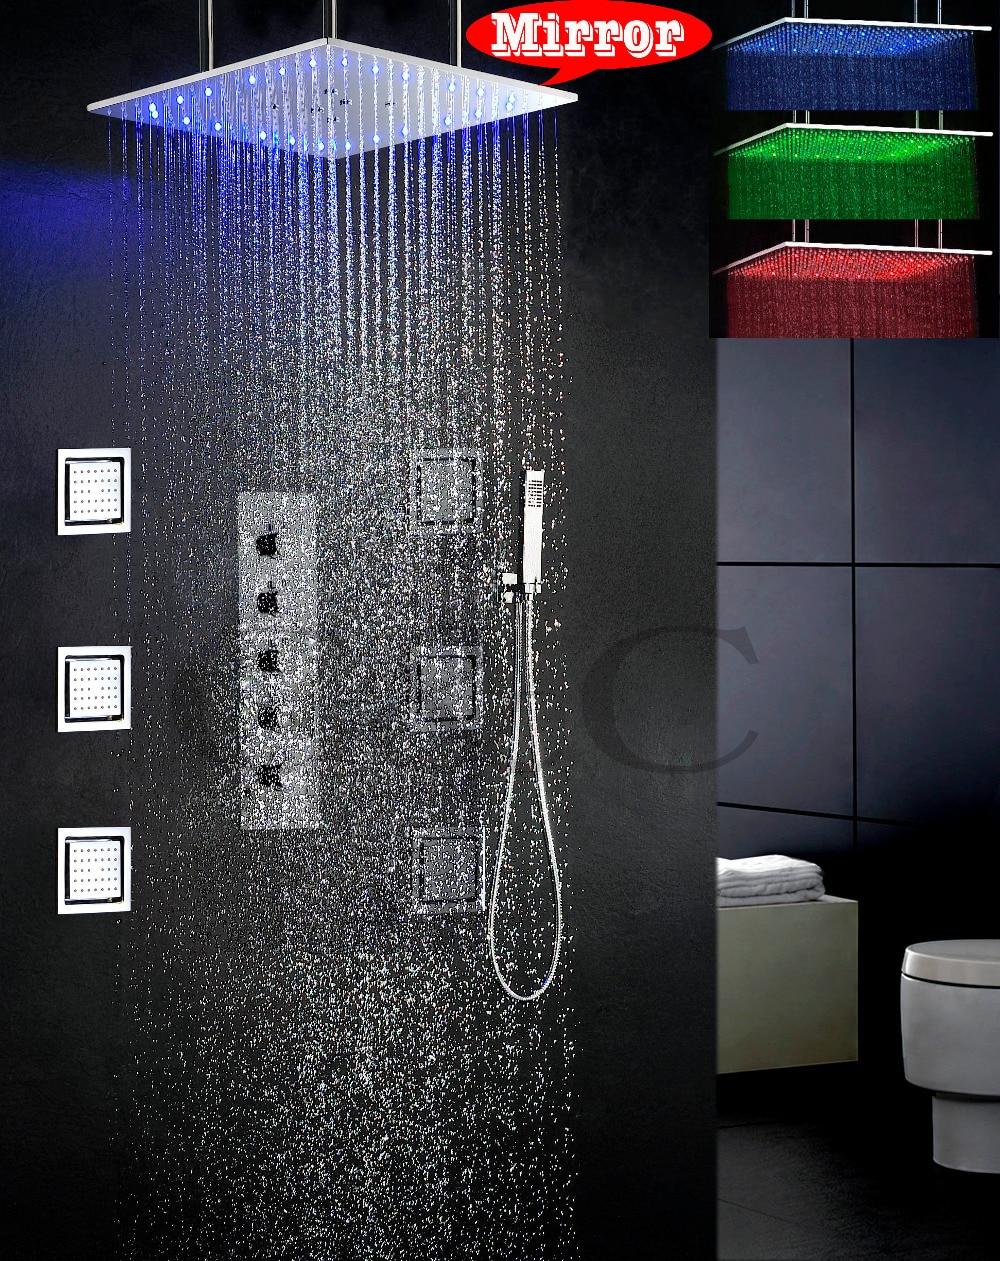 swash and rain bathroom set 20 inch 3 colors led temperature sensitive shower head and 6